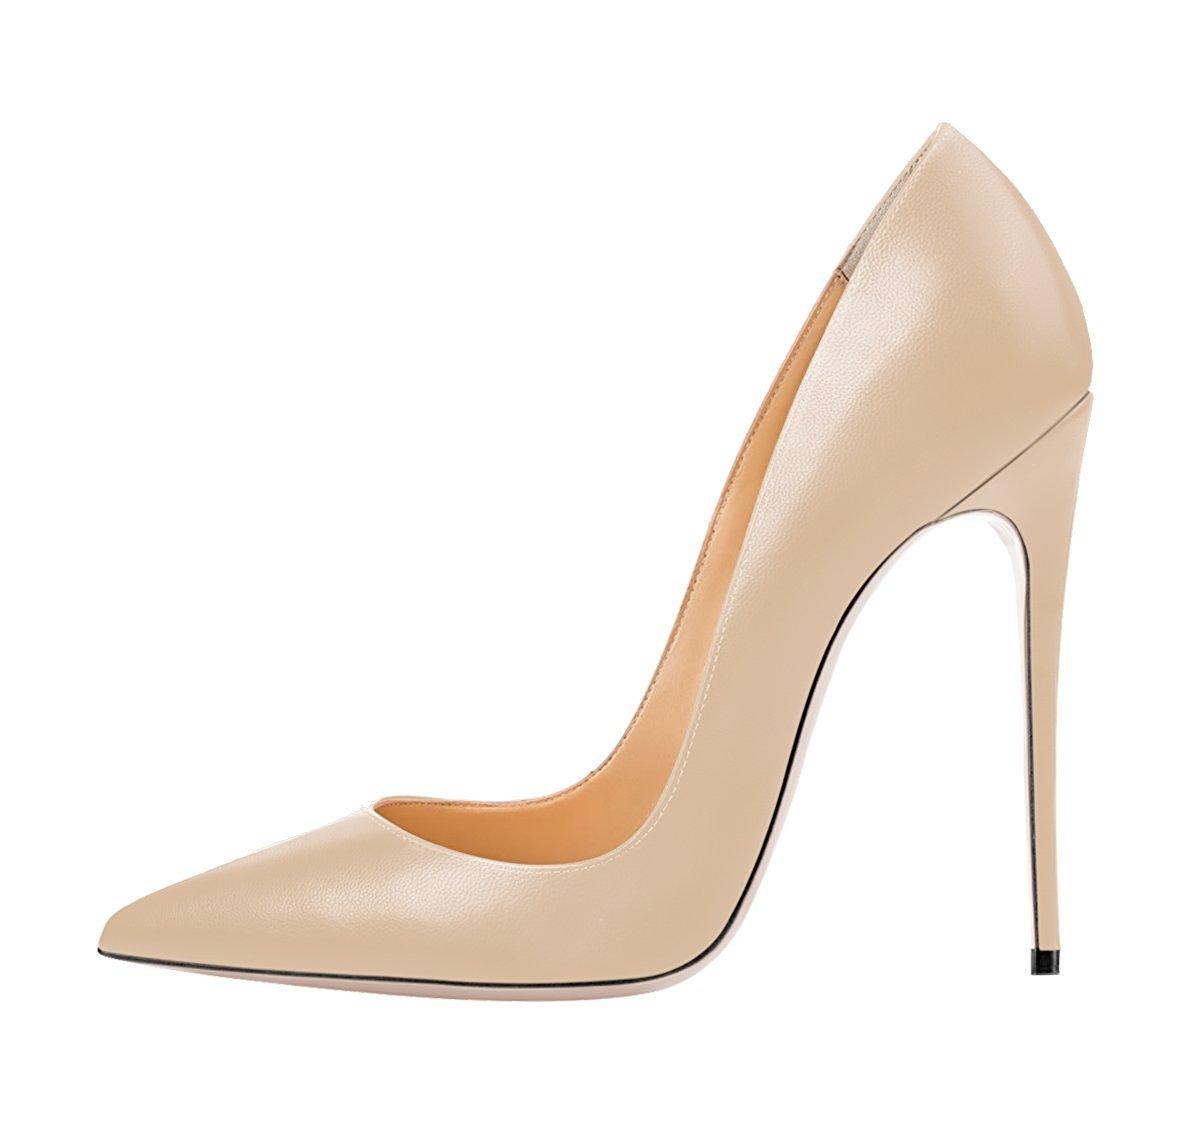 Jushee Damen Sexy Klassische Schwarz Stiletto High Heels Kleid Buuml;ro Pumps45 EU|Nackt02